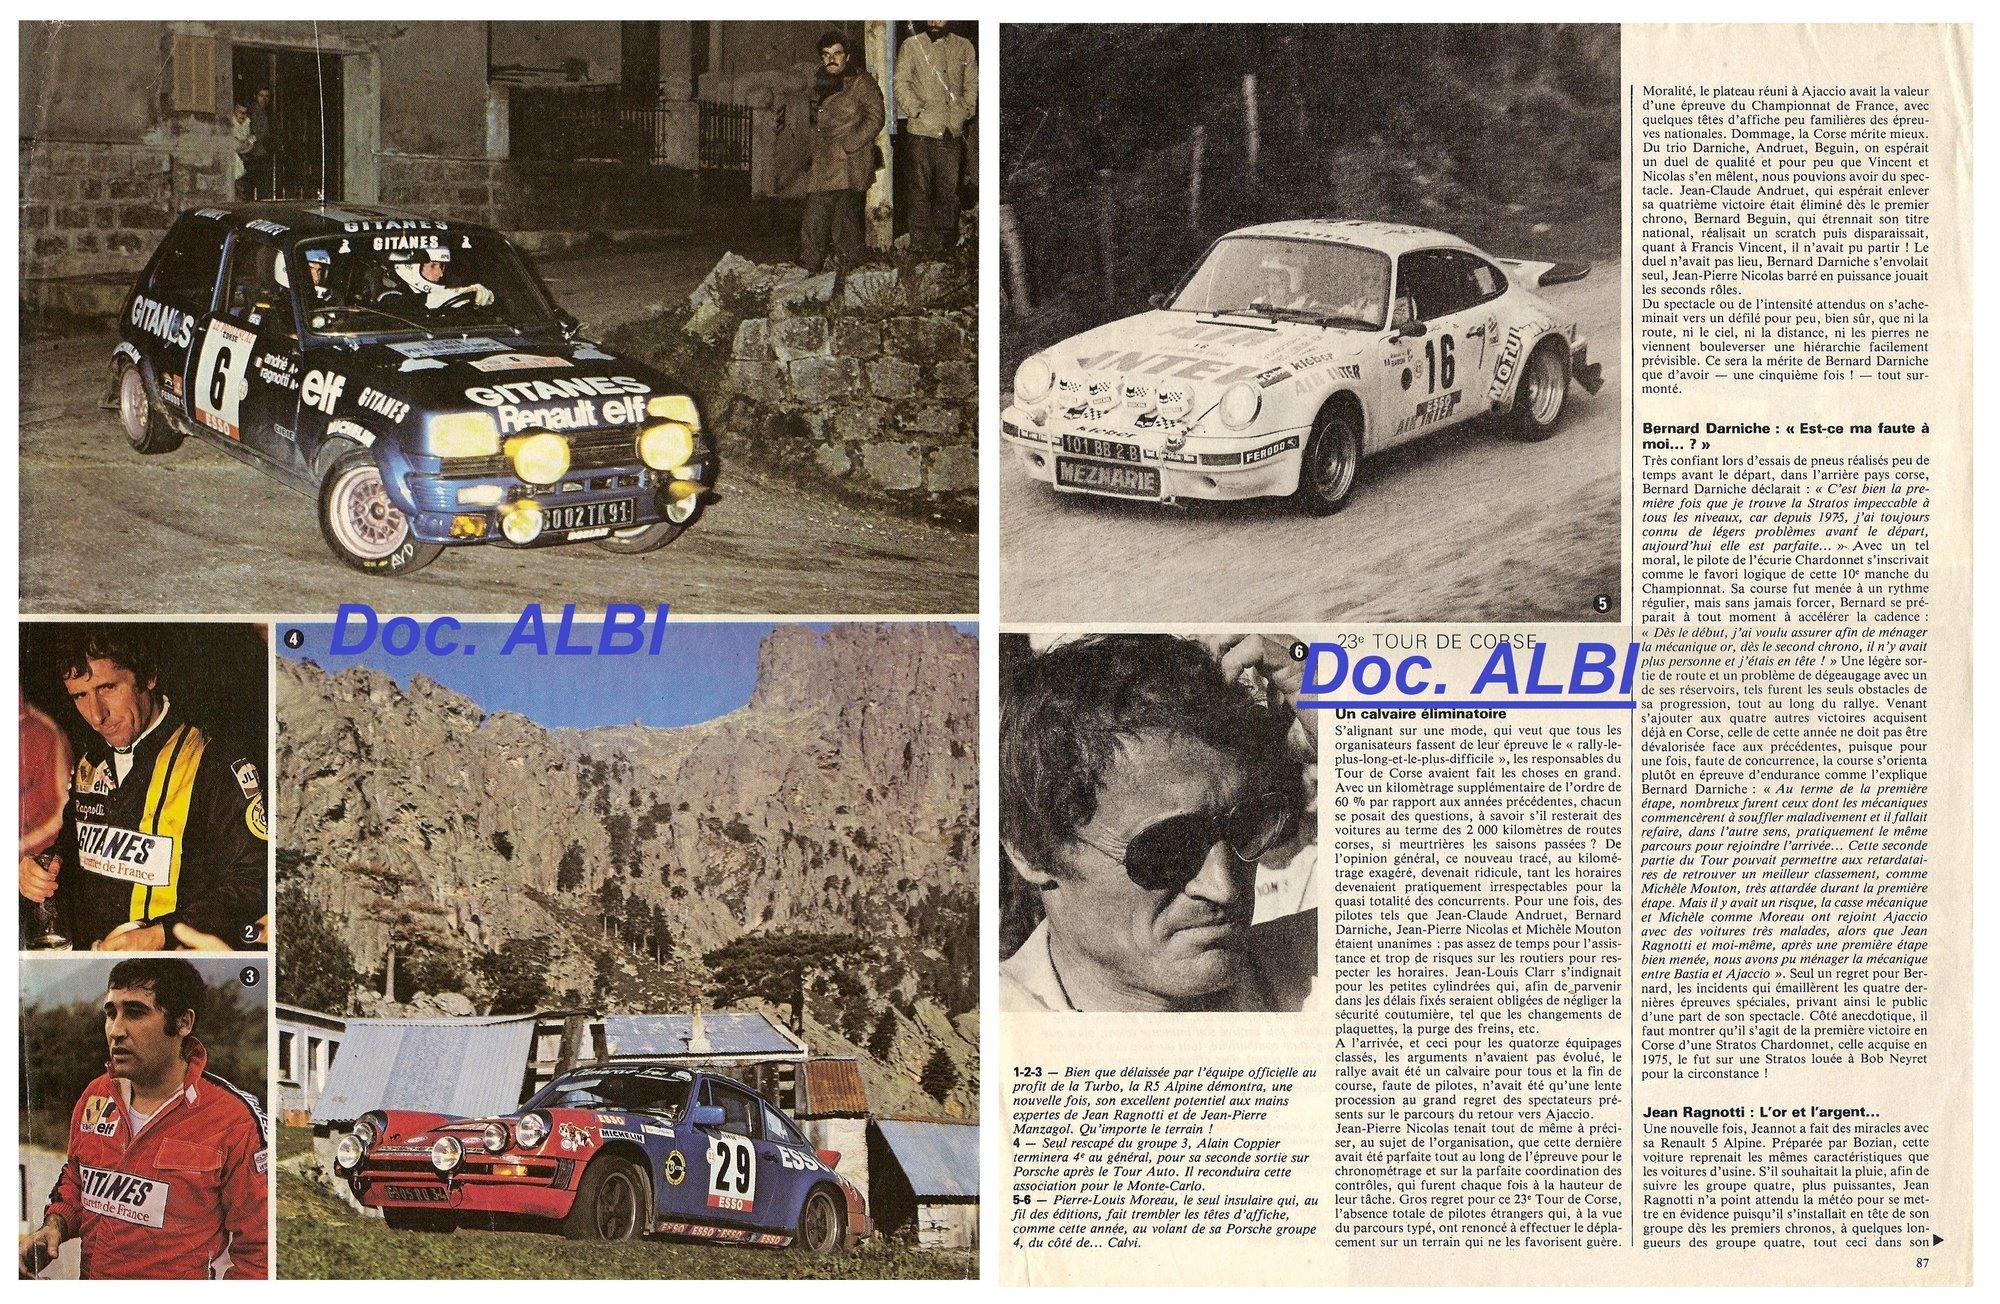 1979-M10-Tour-Corse-A-03-04-a.thumb.jpg.0f528b1ef0bae15d5585002b04b412ef.jpg